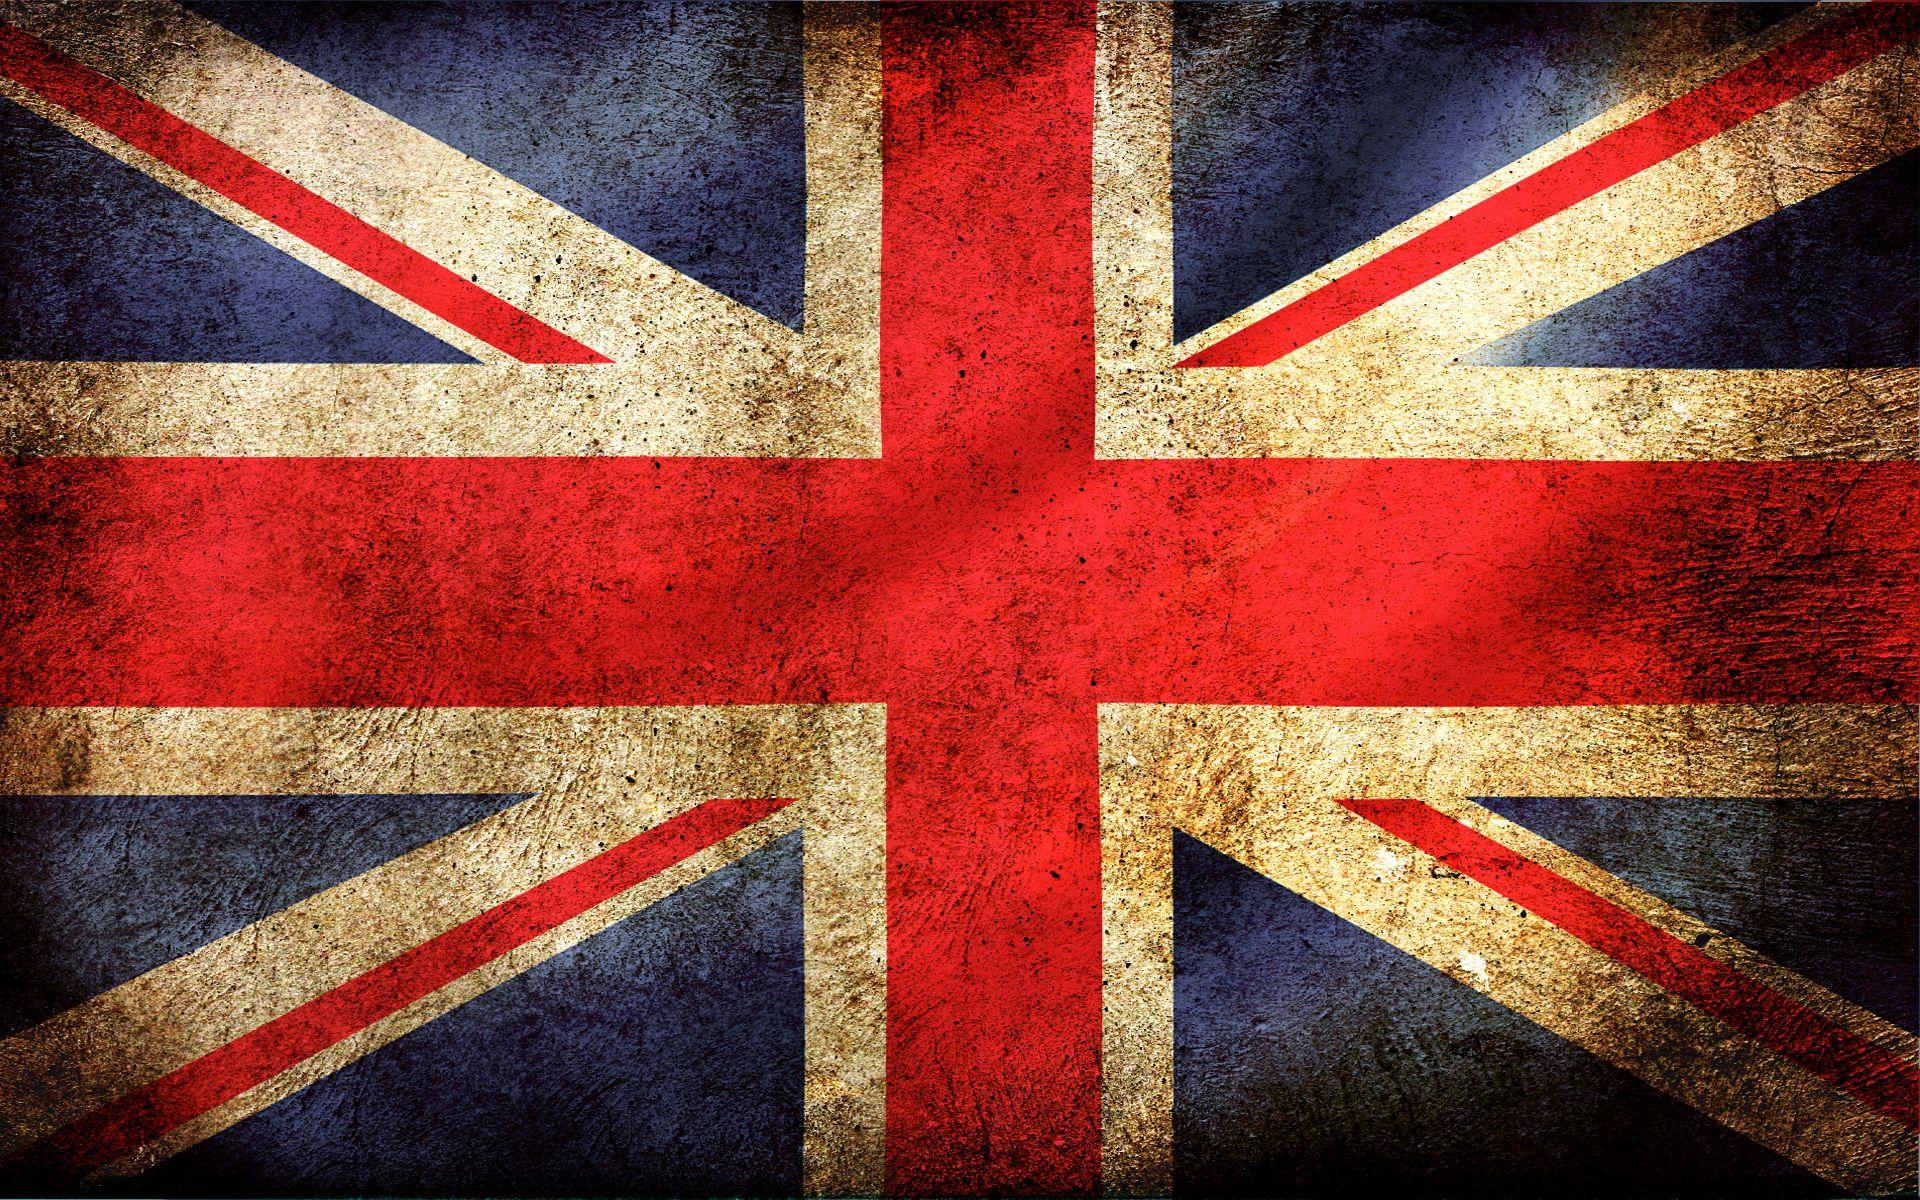 england flag - Google Search | Union Jack | Pinterest